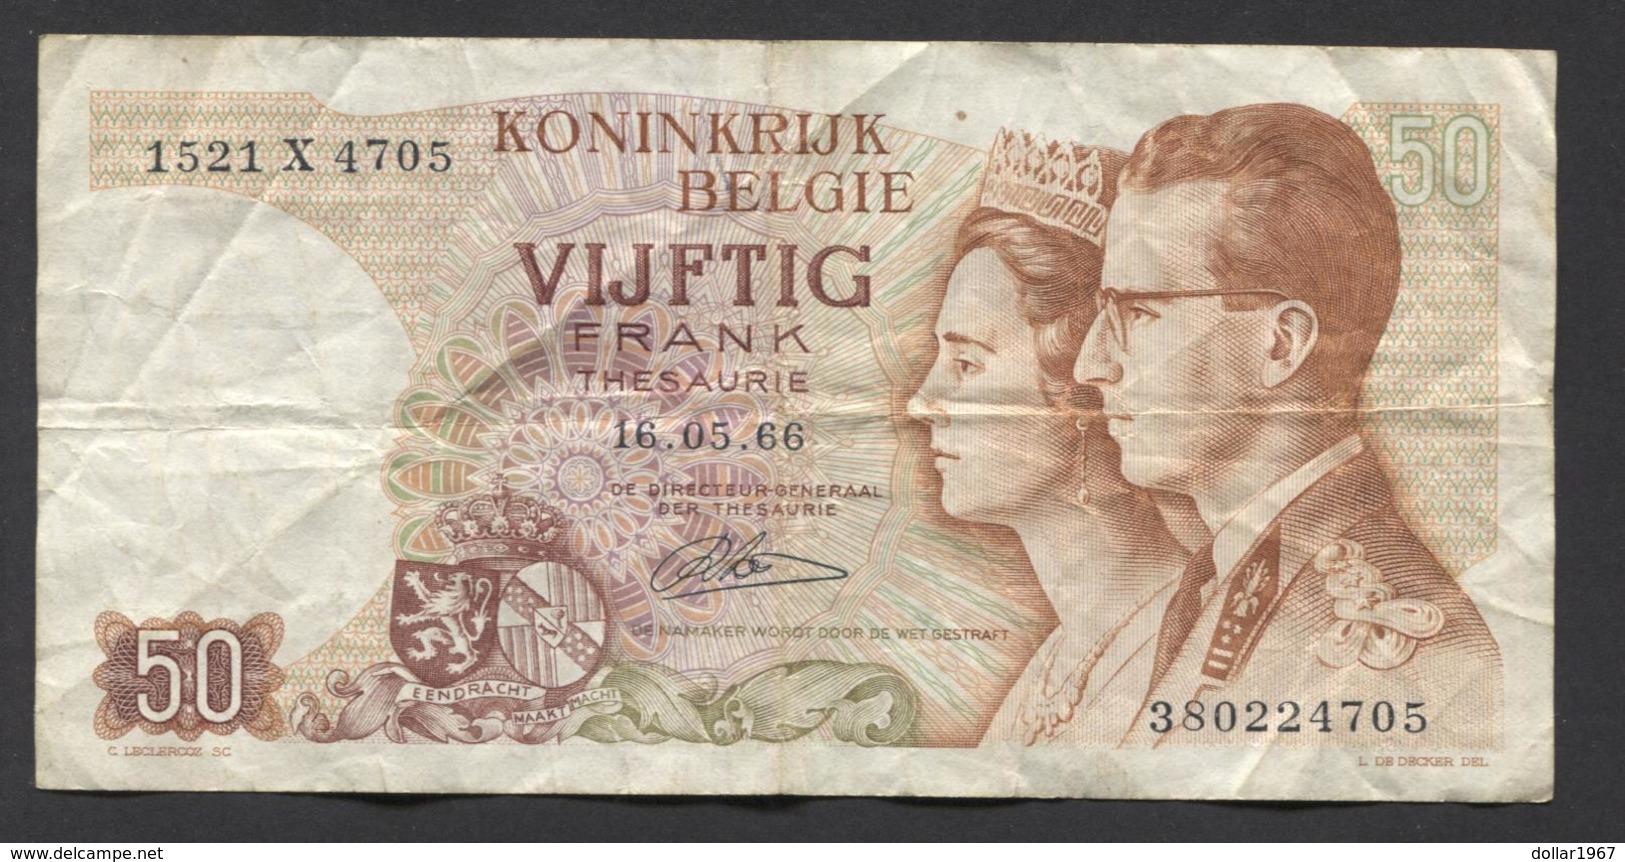 België 50 Frank 14-5- 1966 -NO: 1521 X 4705 - [ 6] Staatskas